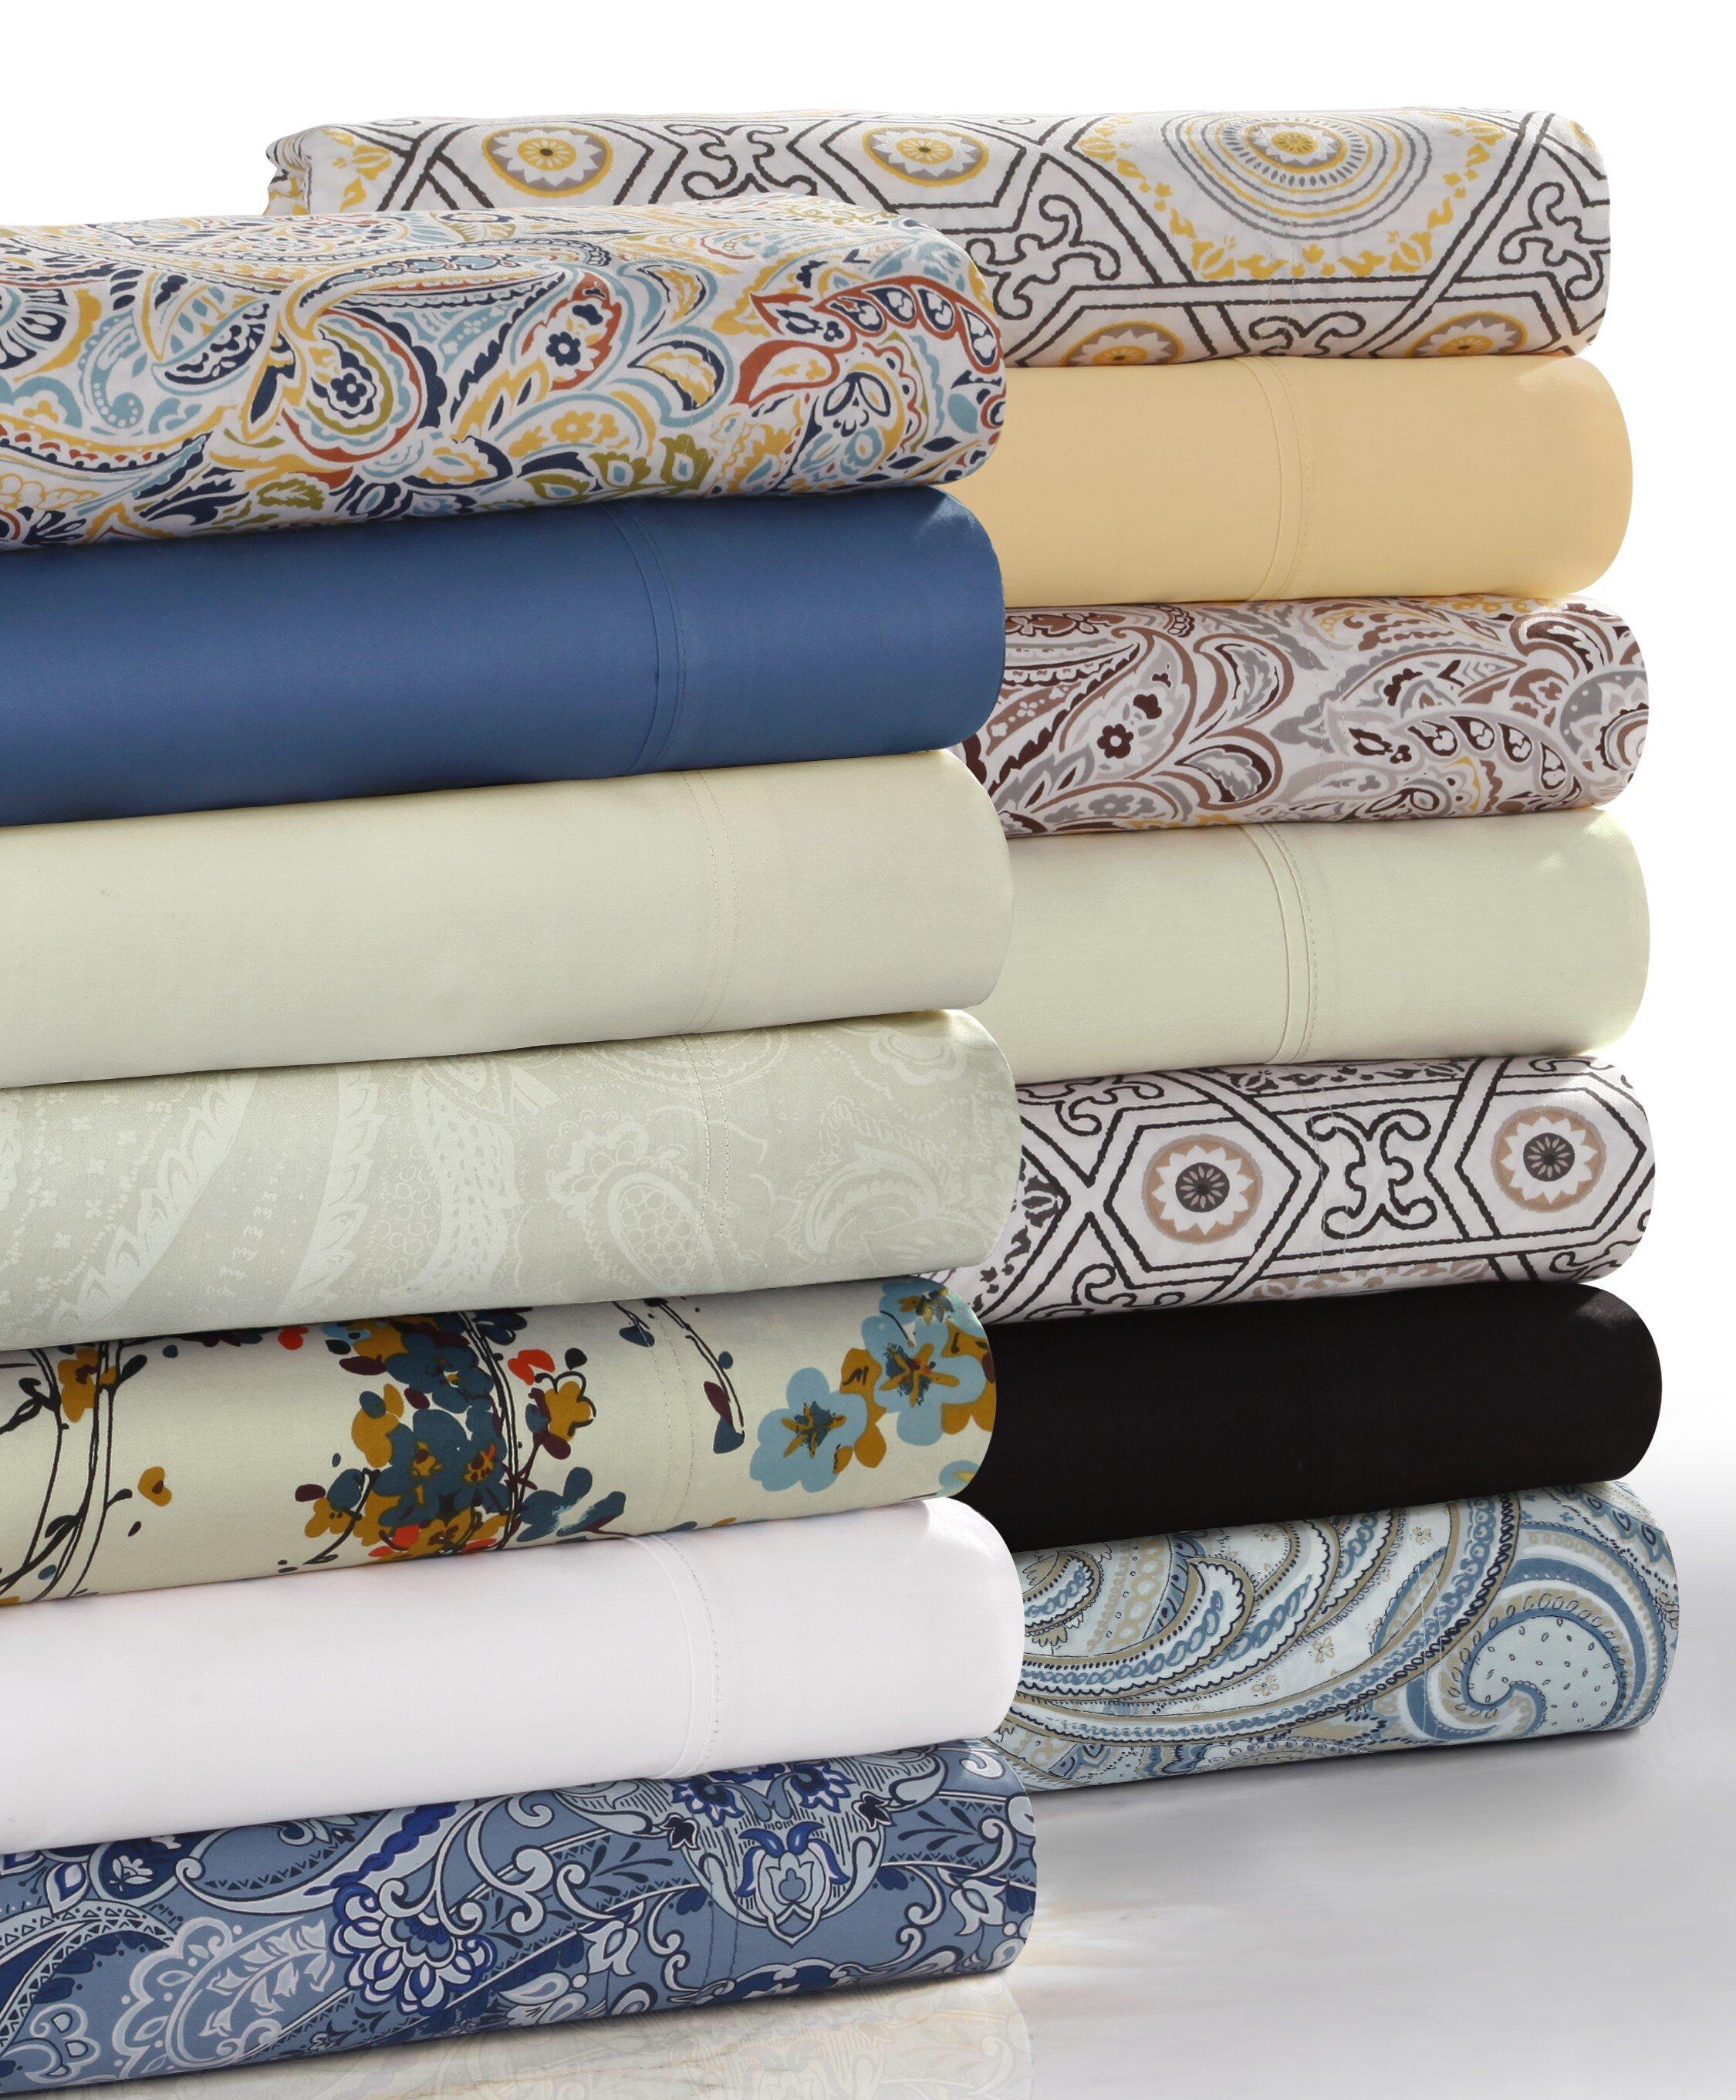 Fleur De Lis Living Sheets Pillowcases You Ll Love In 2021 Wayfair